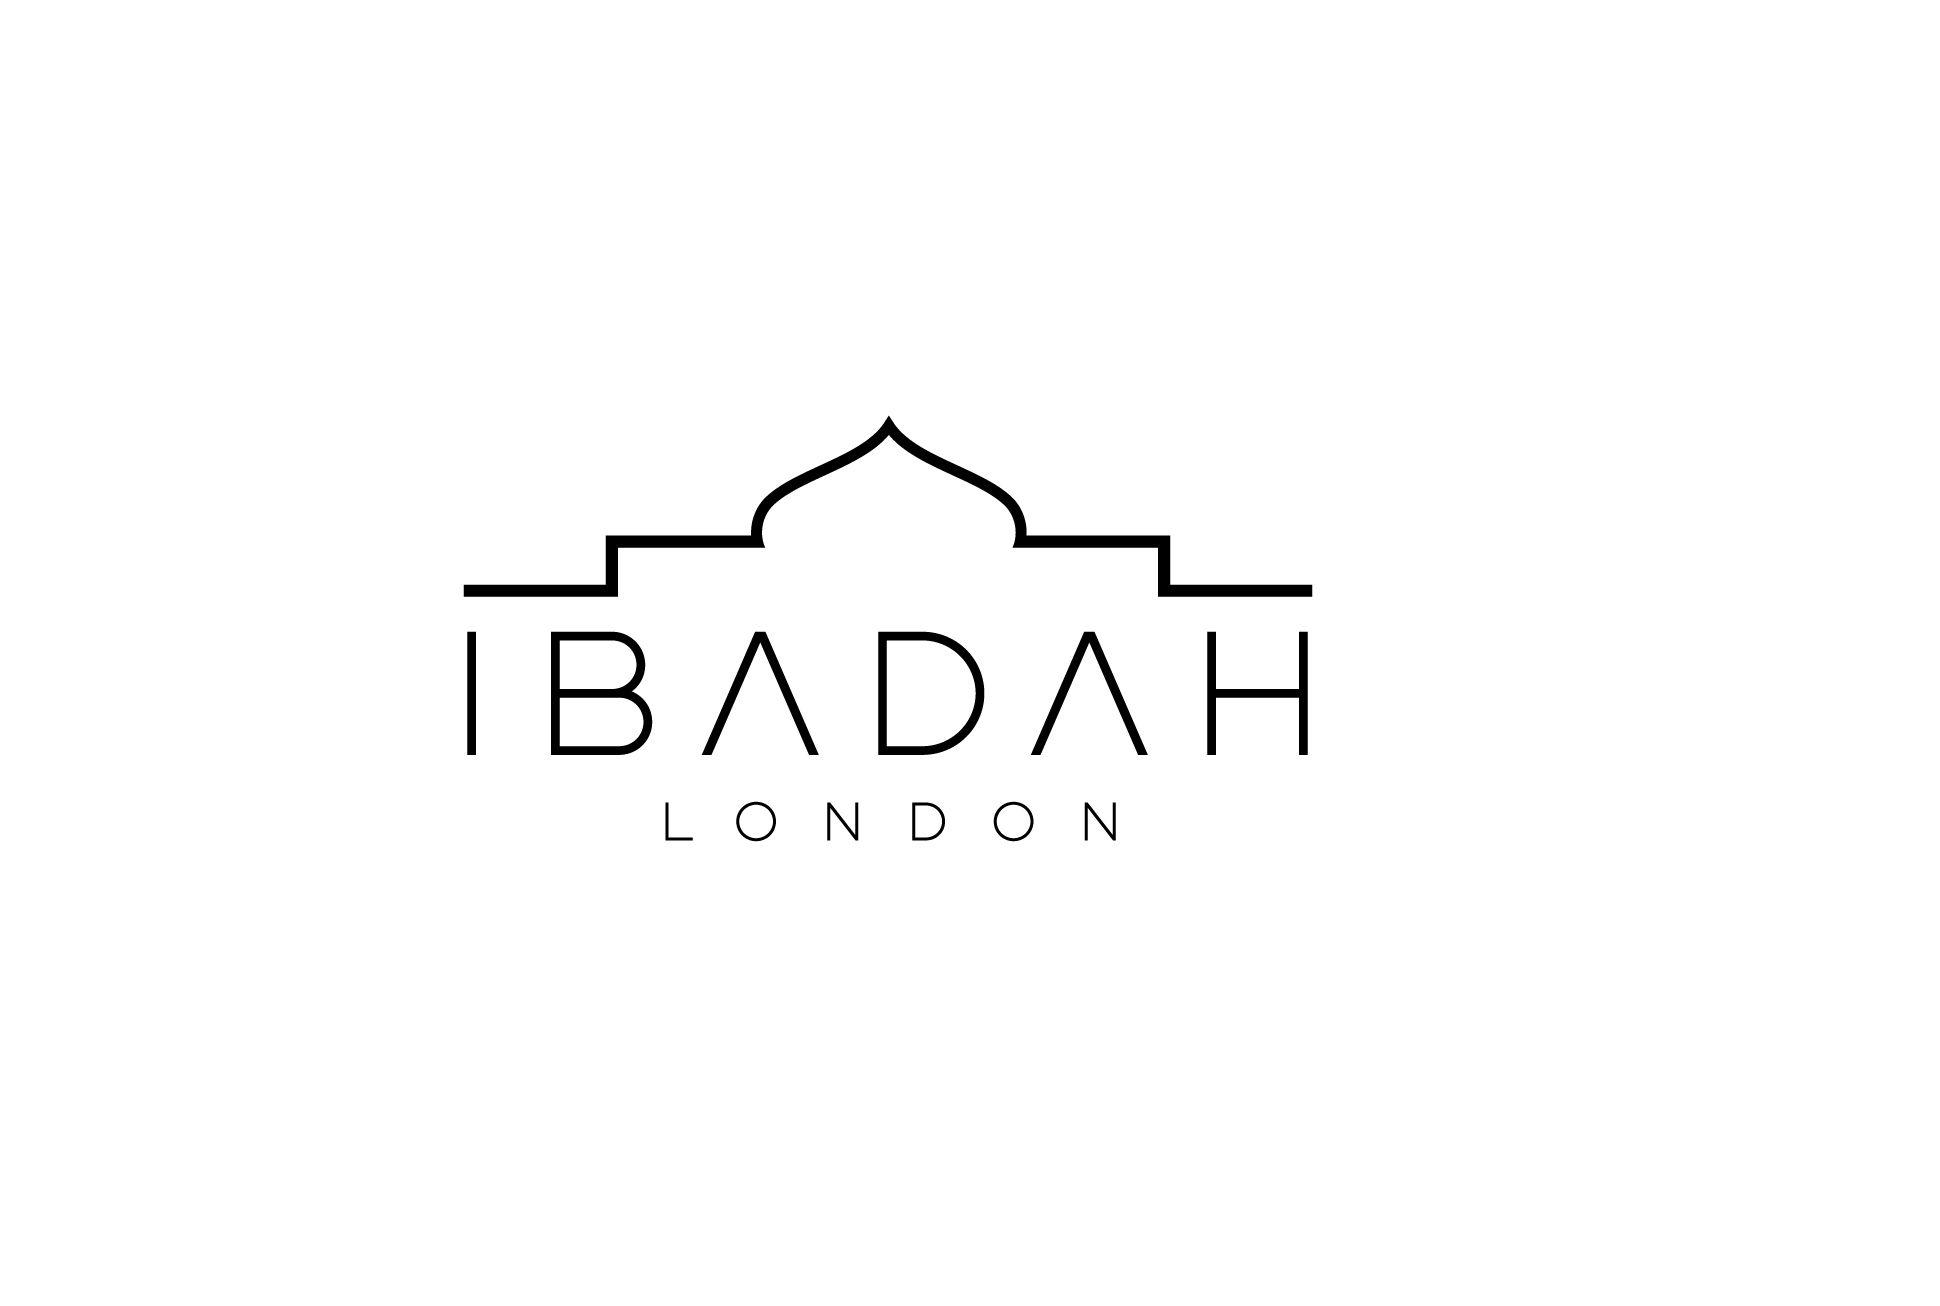 Ibadah london